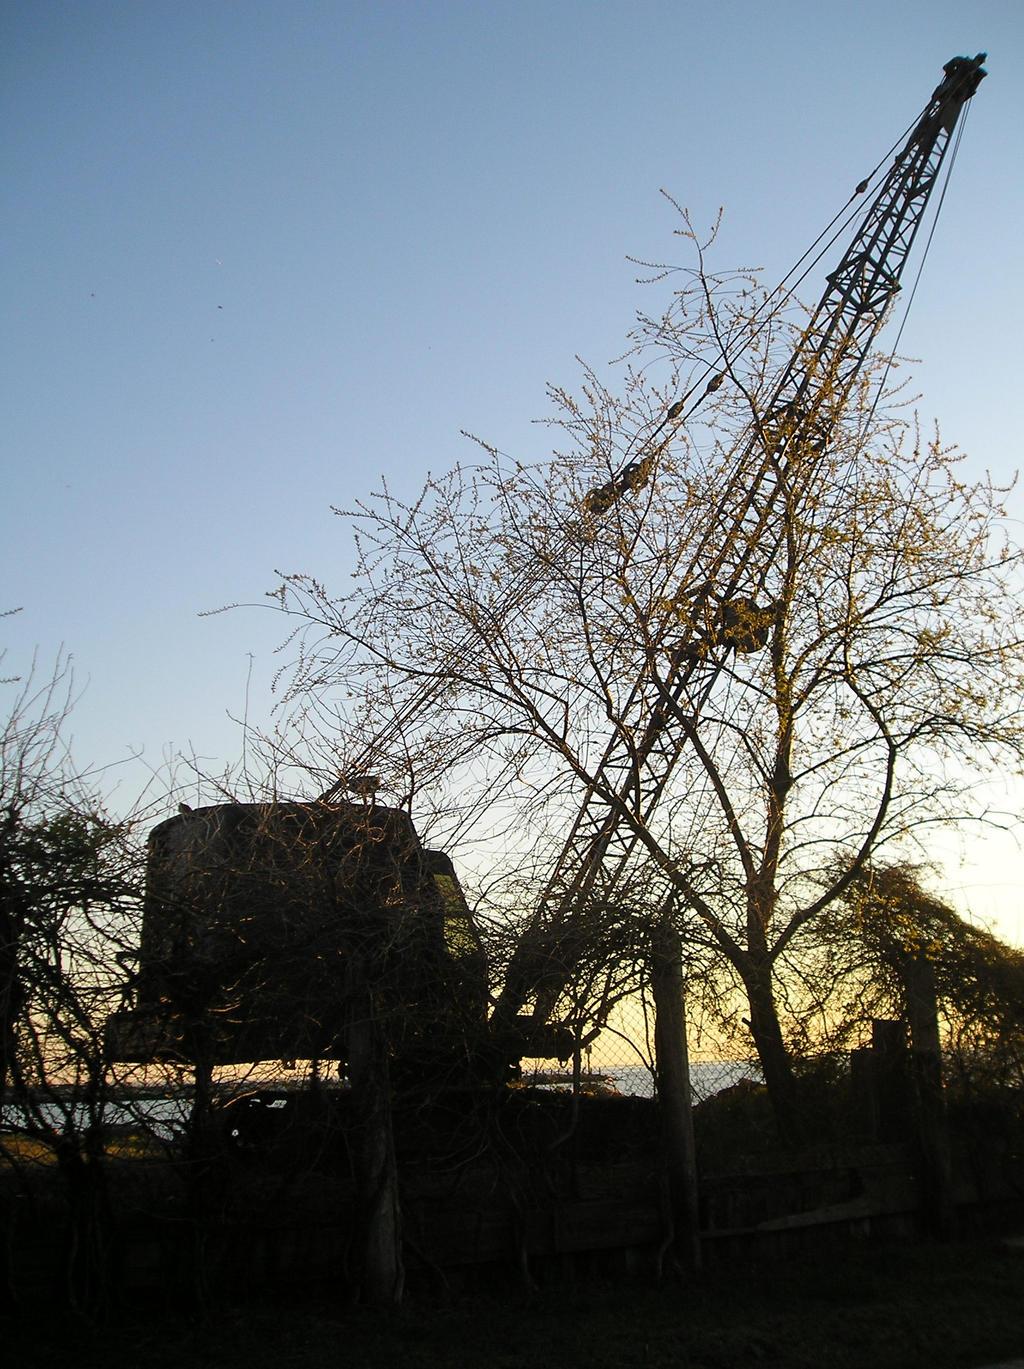 Crane by Programmer64